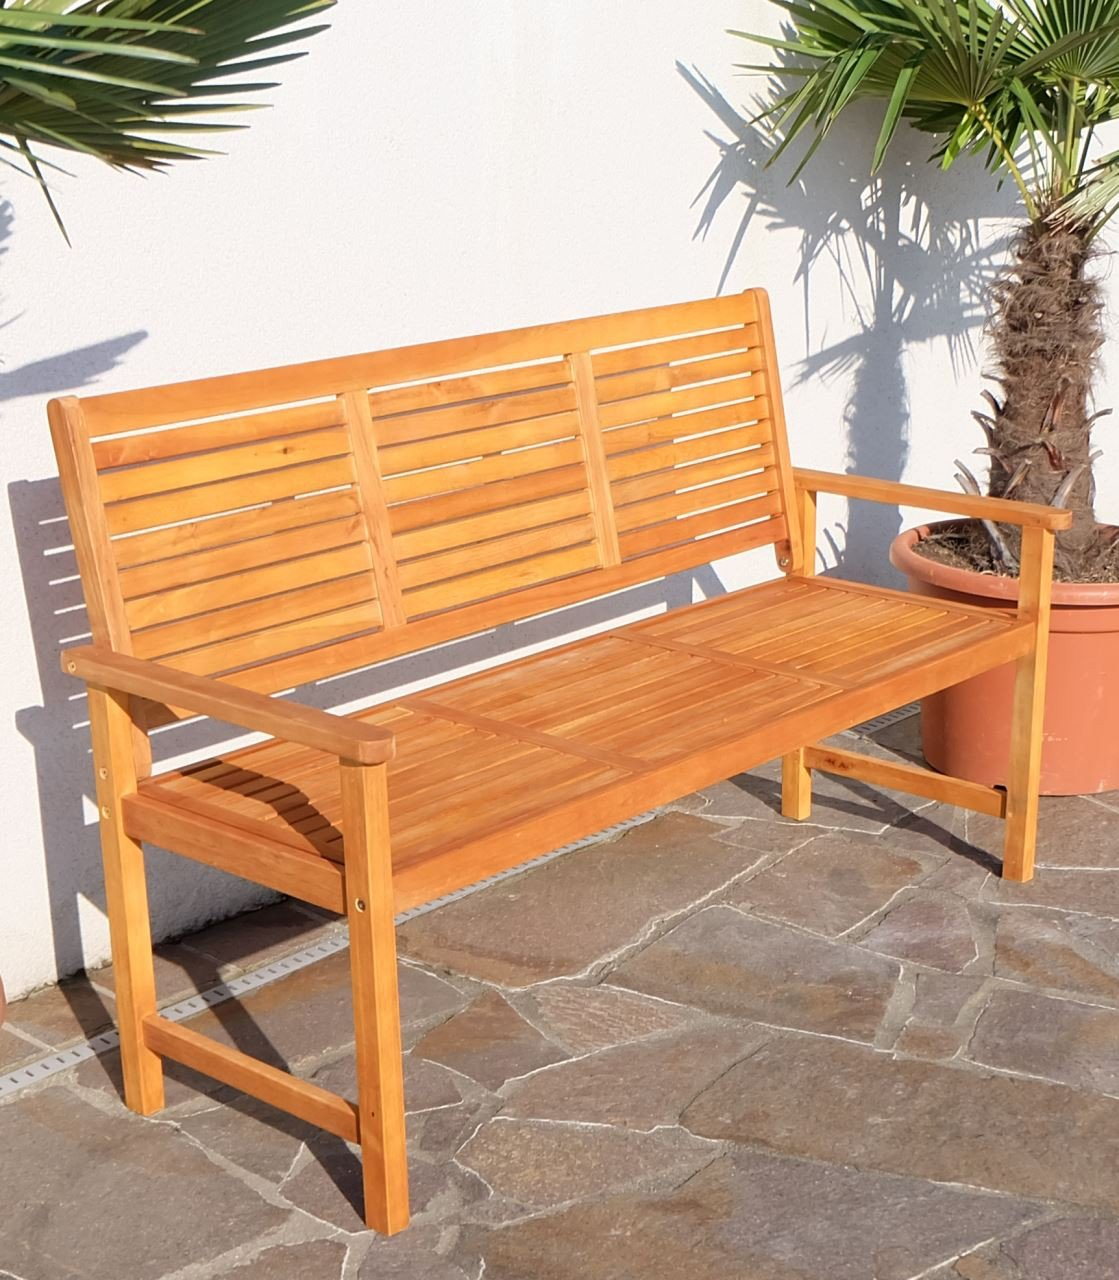 Design Gartenbank Parkbank Sitzbank 3-Sitzer Bank Gartenmöbel Holz Eukalyptus w.Teak Modell: 'SARIA-EU' von AS-S